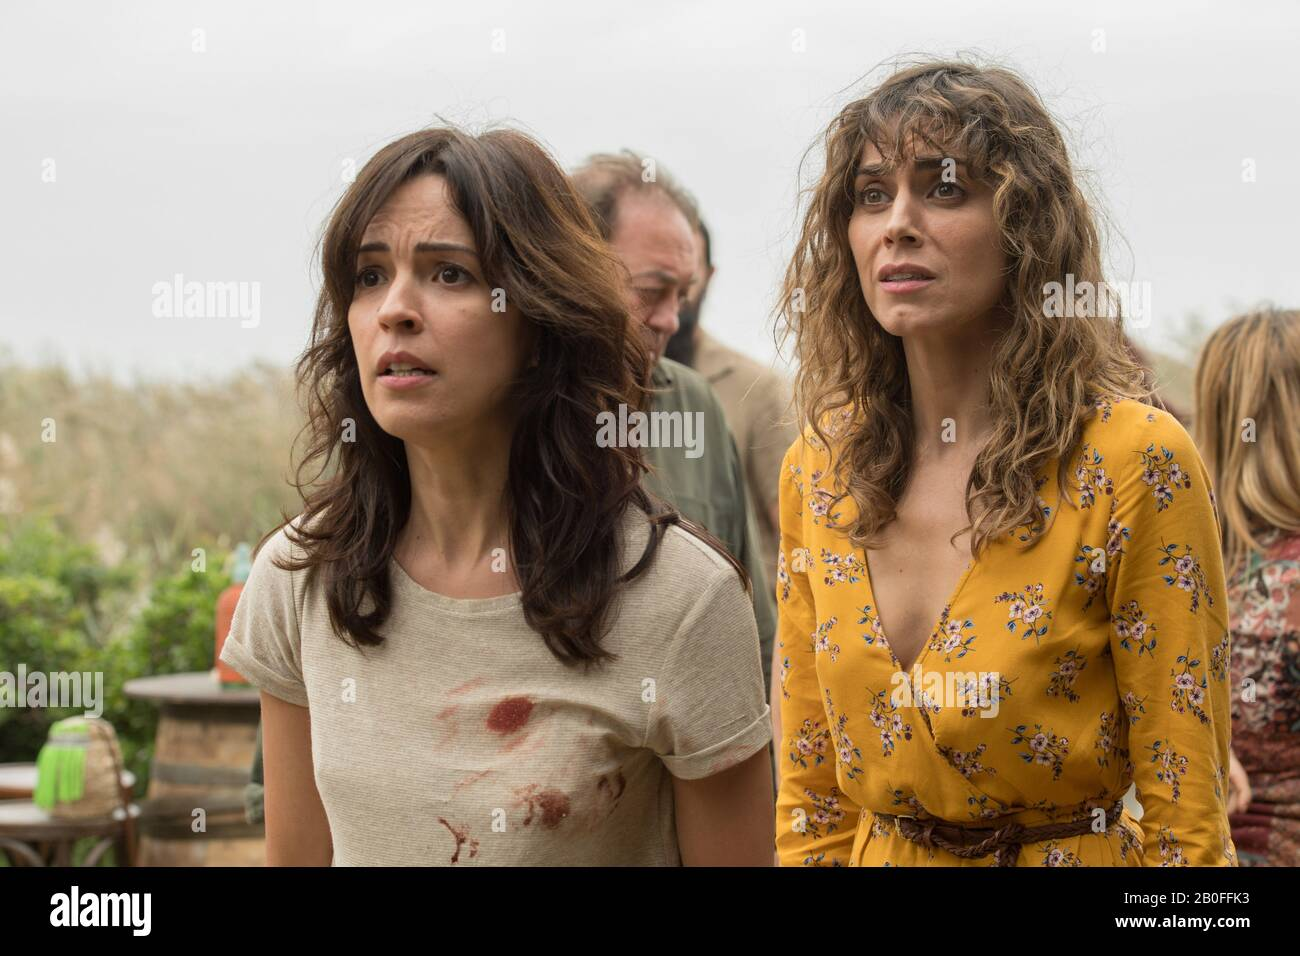 https www alamy com el embarcadero tv series 2019 2020 spain created by esther martnez lobato lex pina 2020 season 2 vernica snchez irene arcos image344548935 html